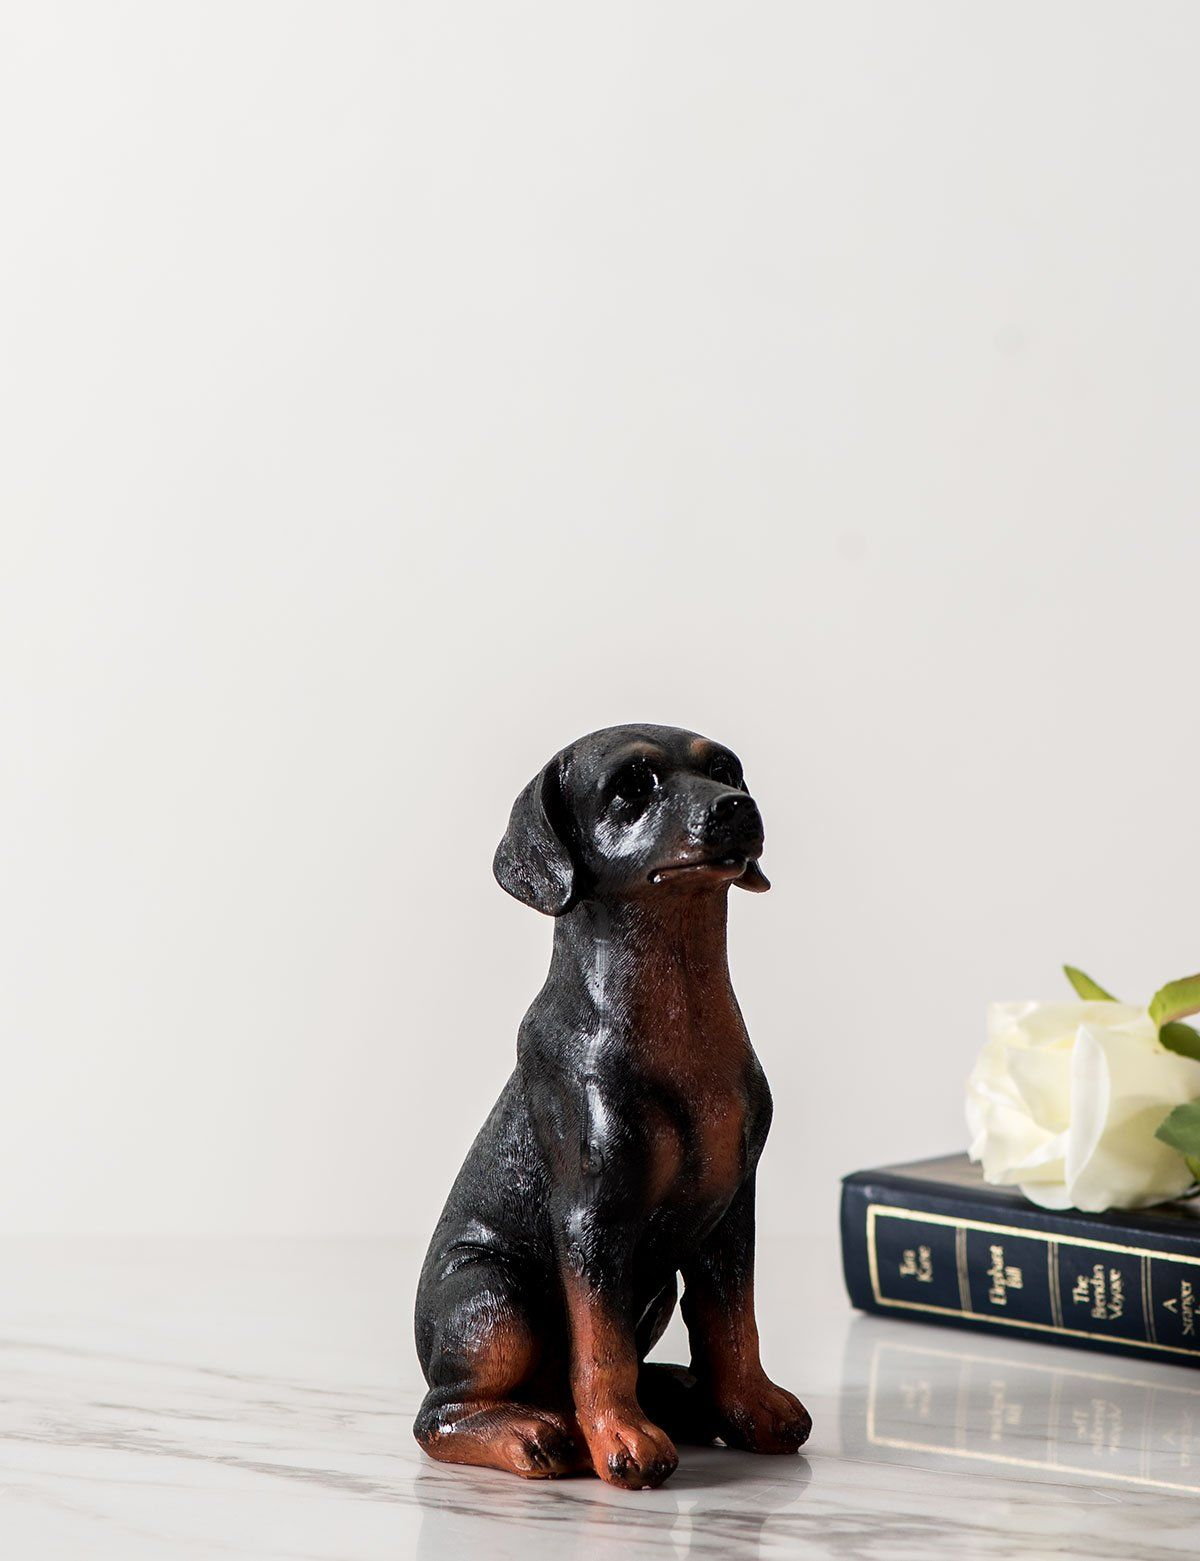 Adorable Dog Figurine Rottweiler Pup Thedecorkart Rottweiler Puppies Cute Dogs Dog Figurines